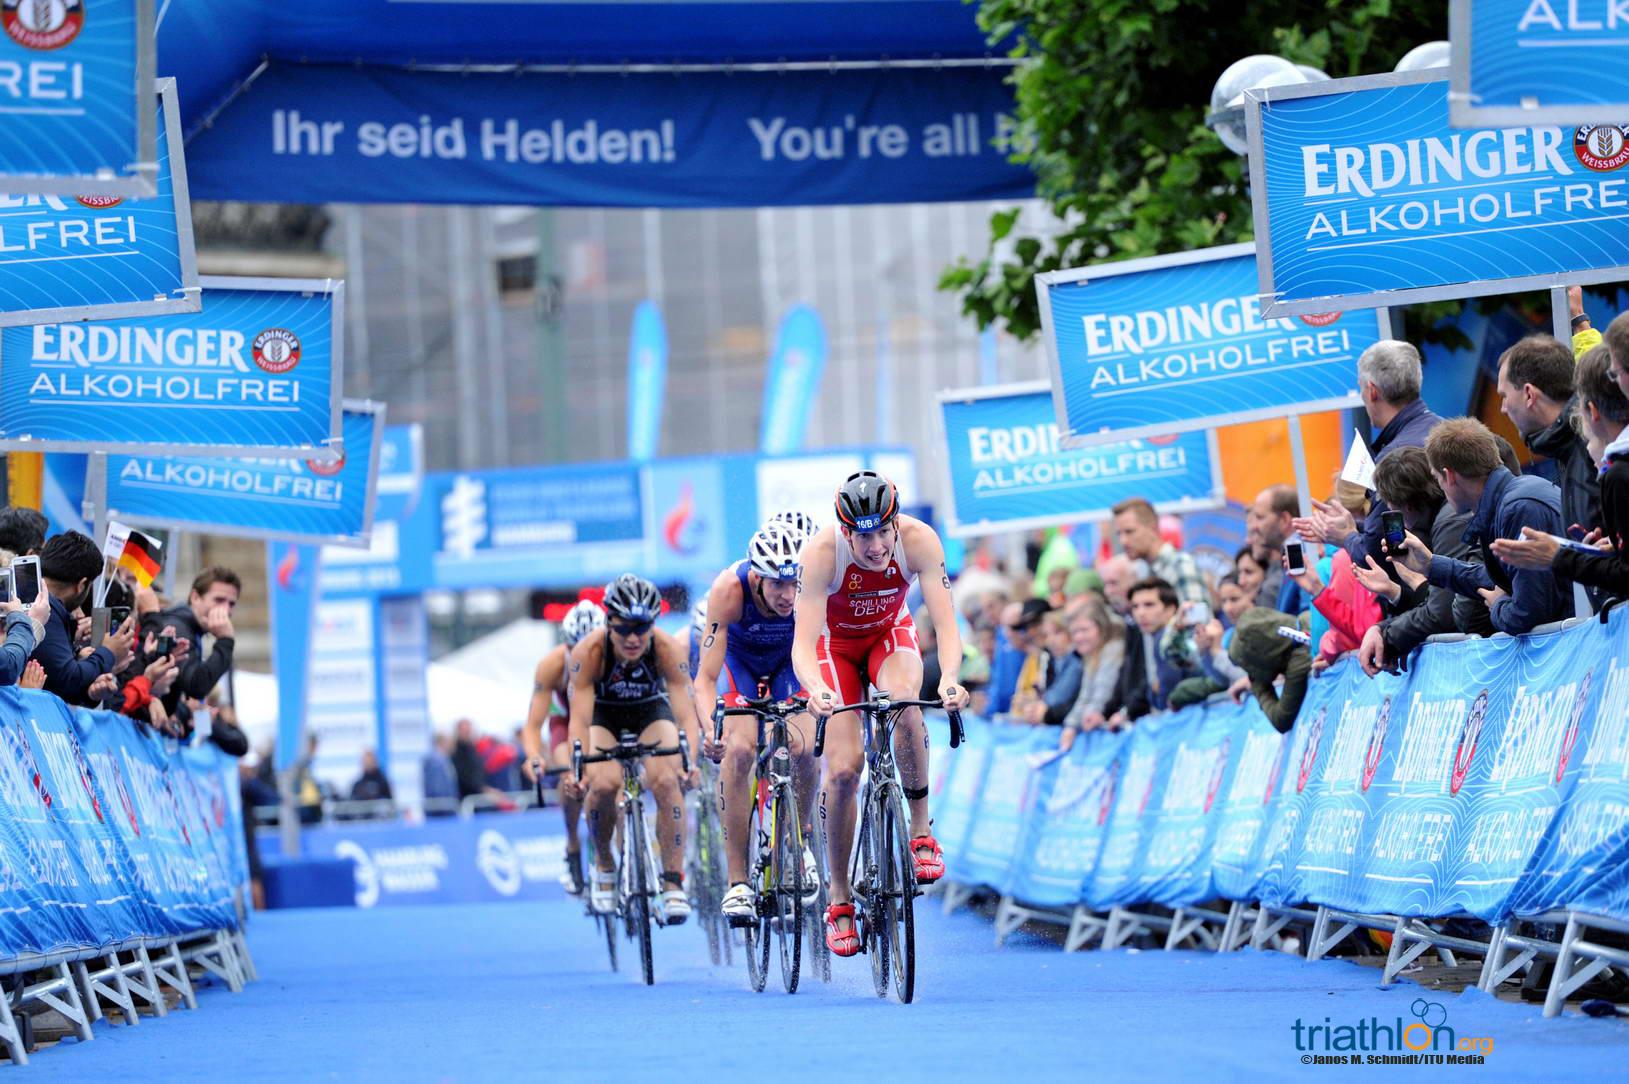 triathlon world series hamburg